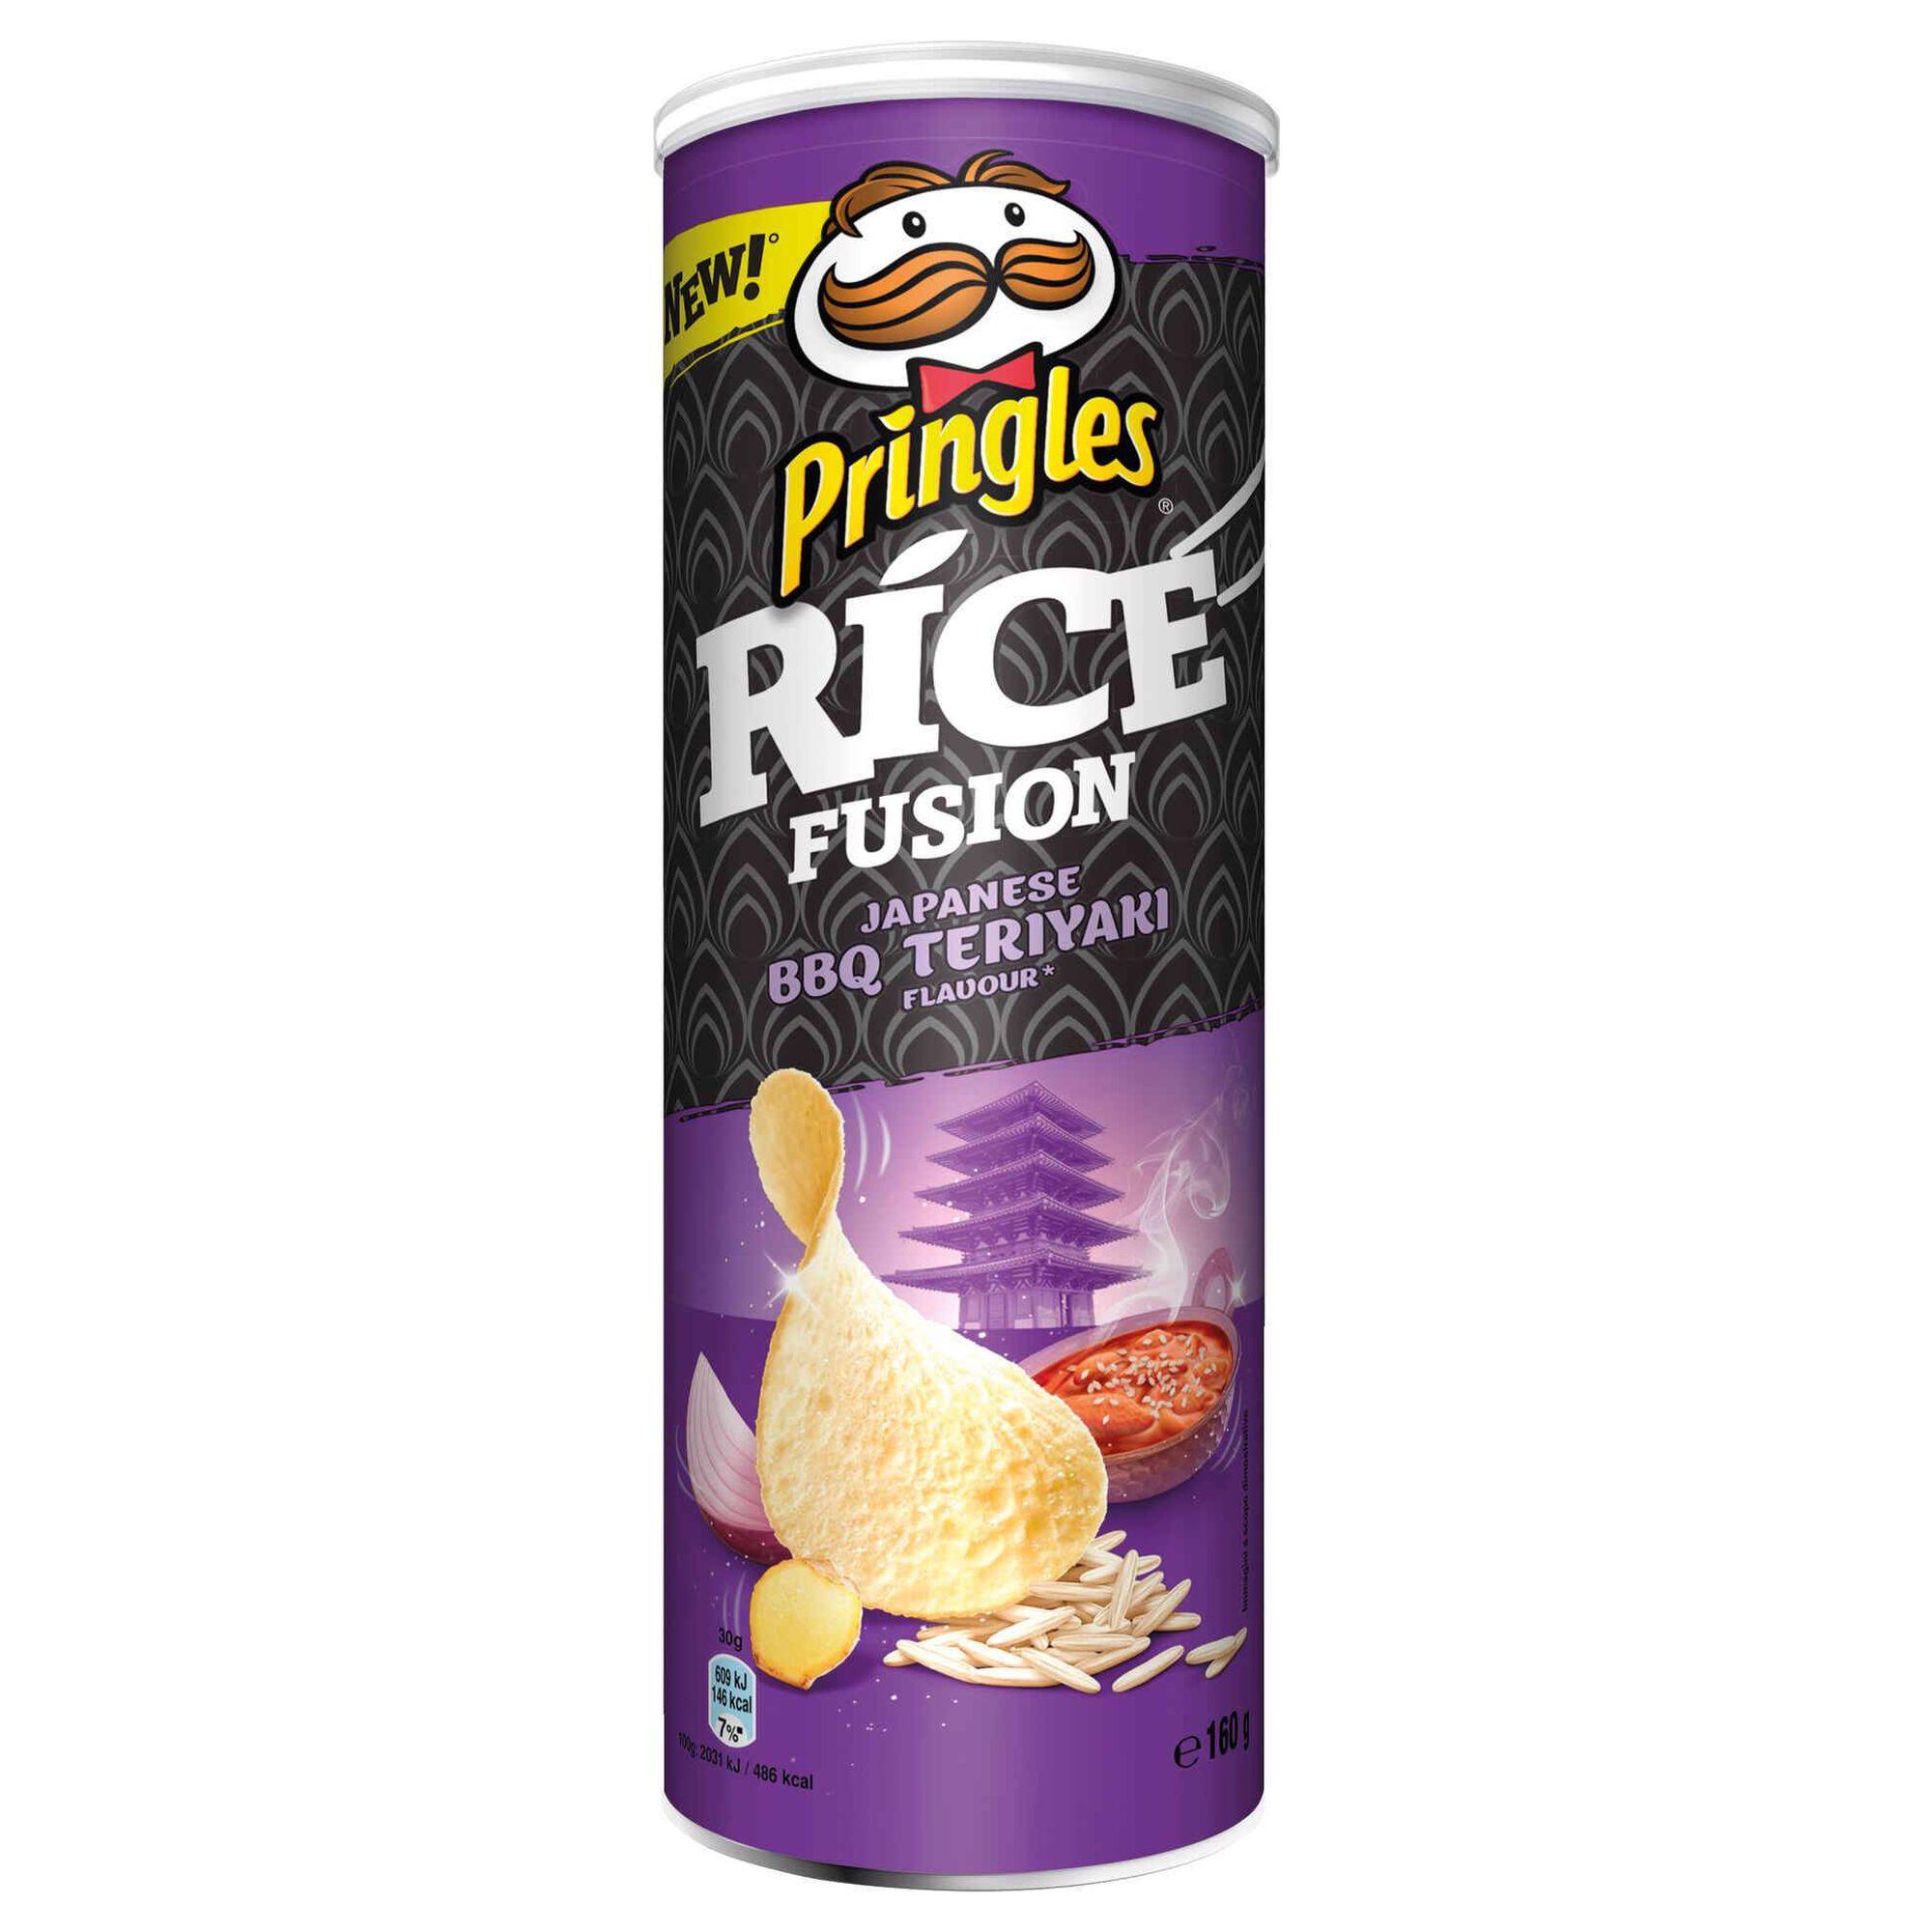 Snacks Batata Rice Fusion Japanese Barbecue Teriyaki